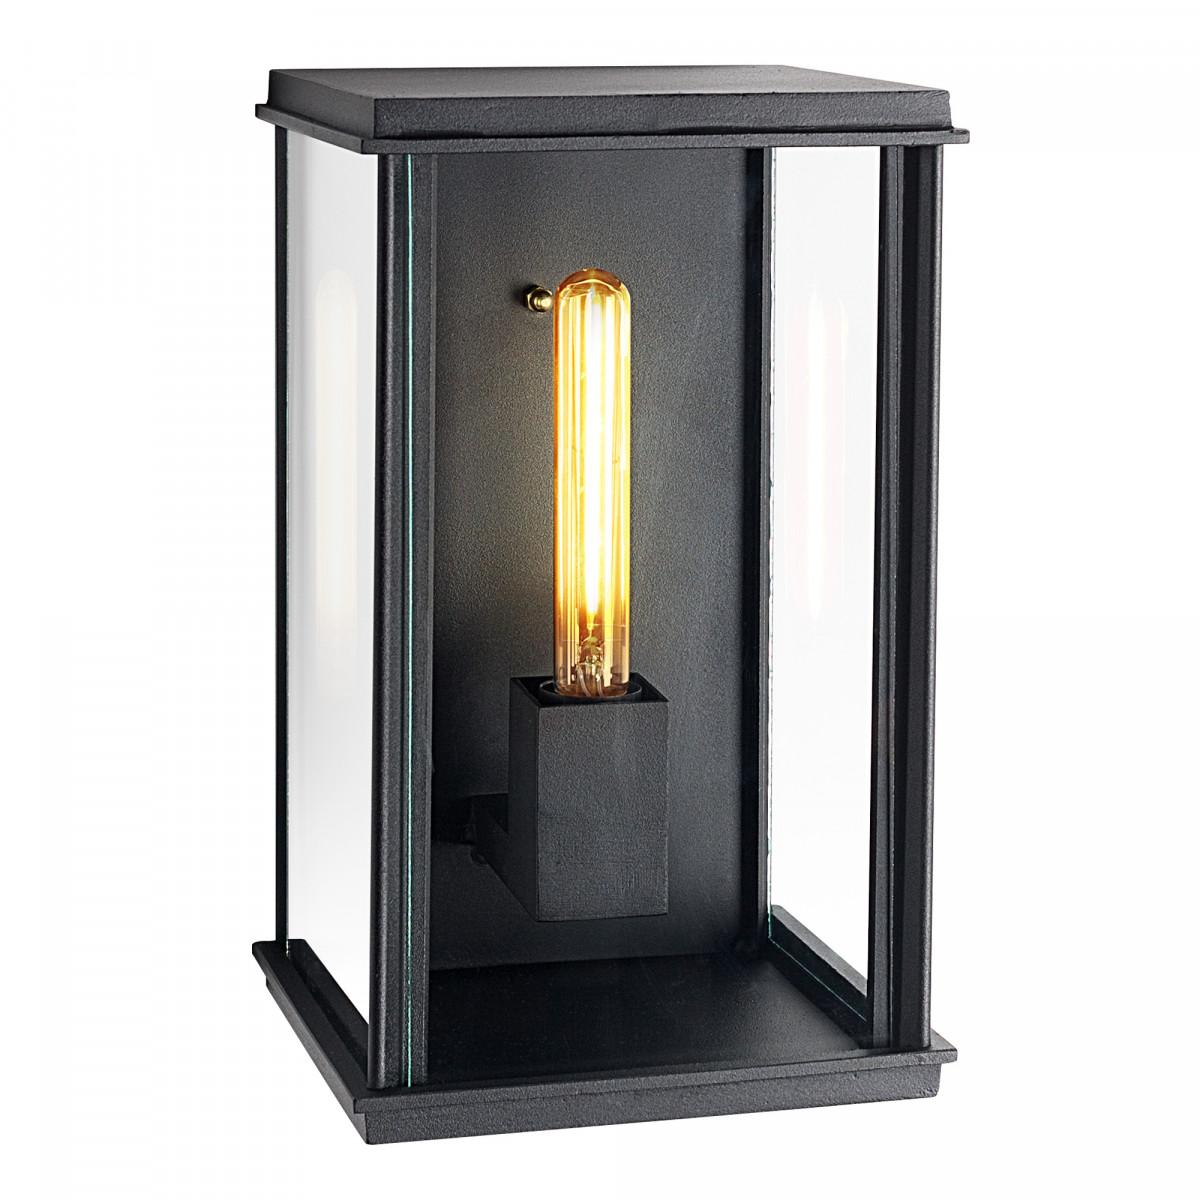 Kubische flache Wandlampe Capital XL Schwarz